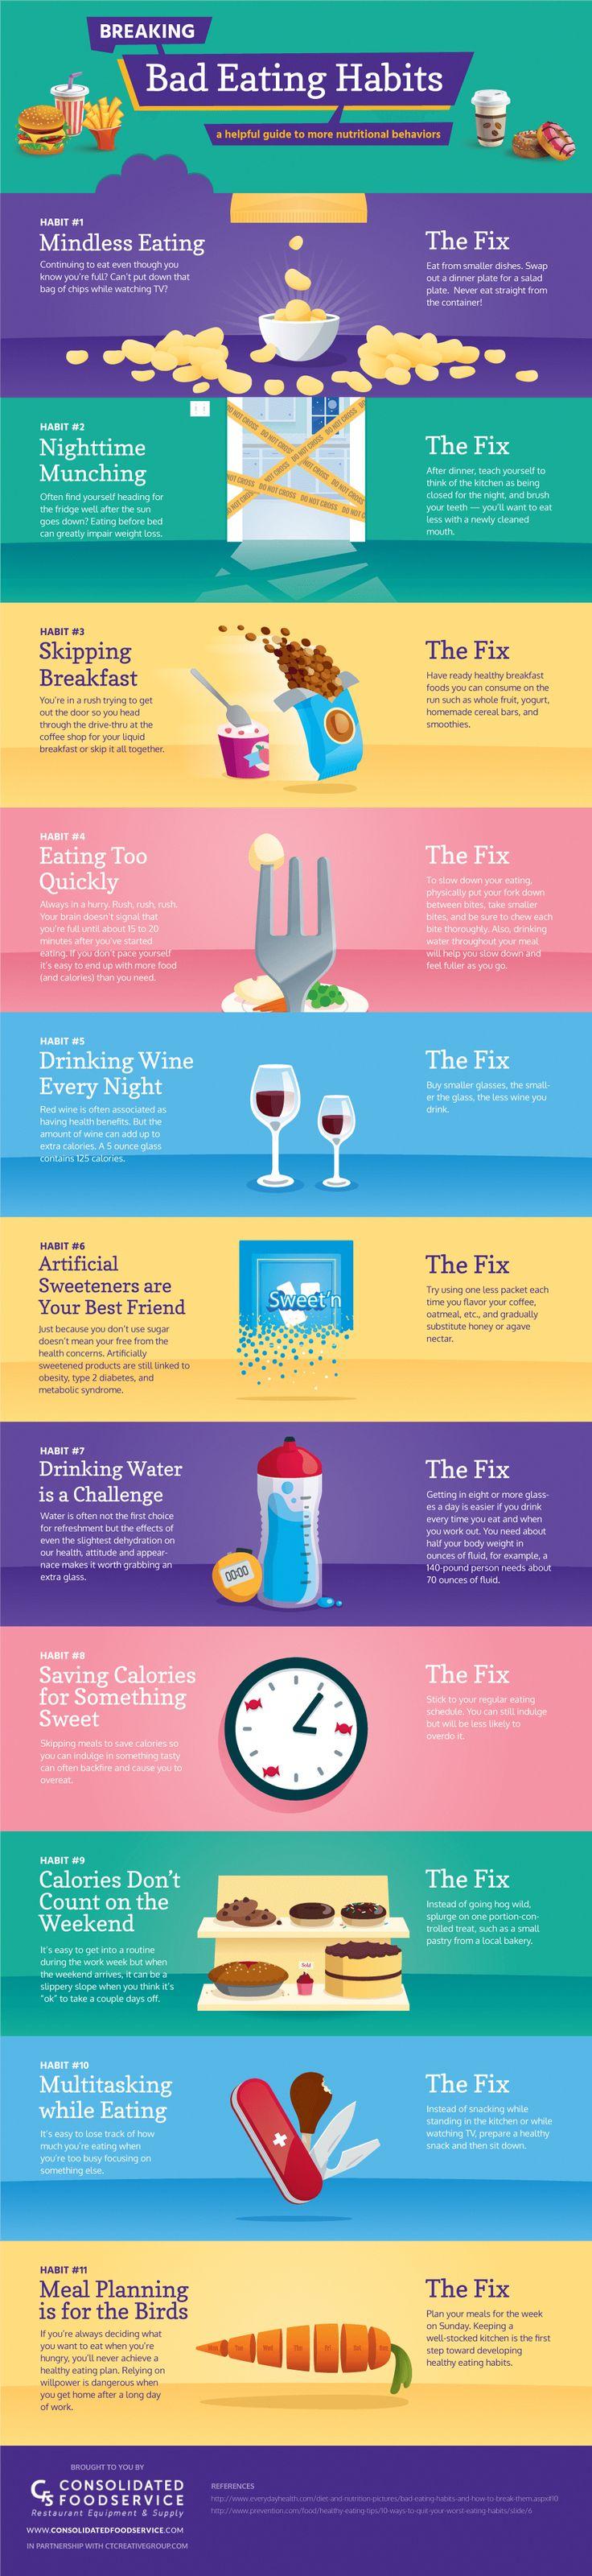 Breaking Bad Eating Habits  Infographic  Health